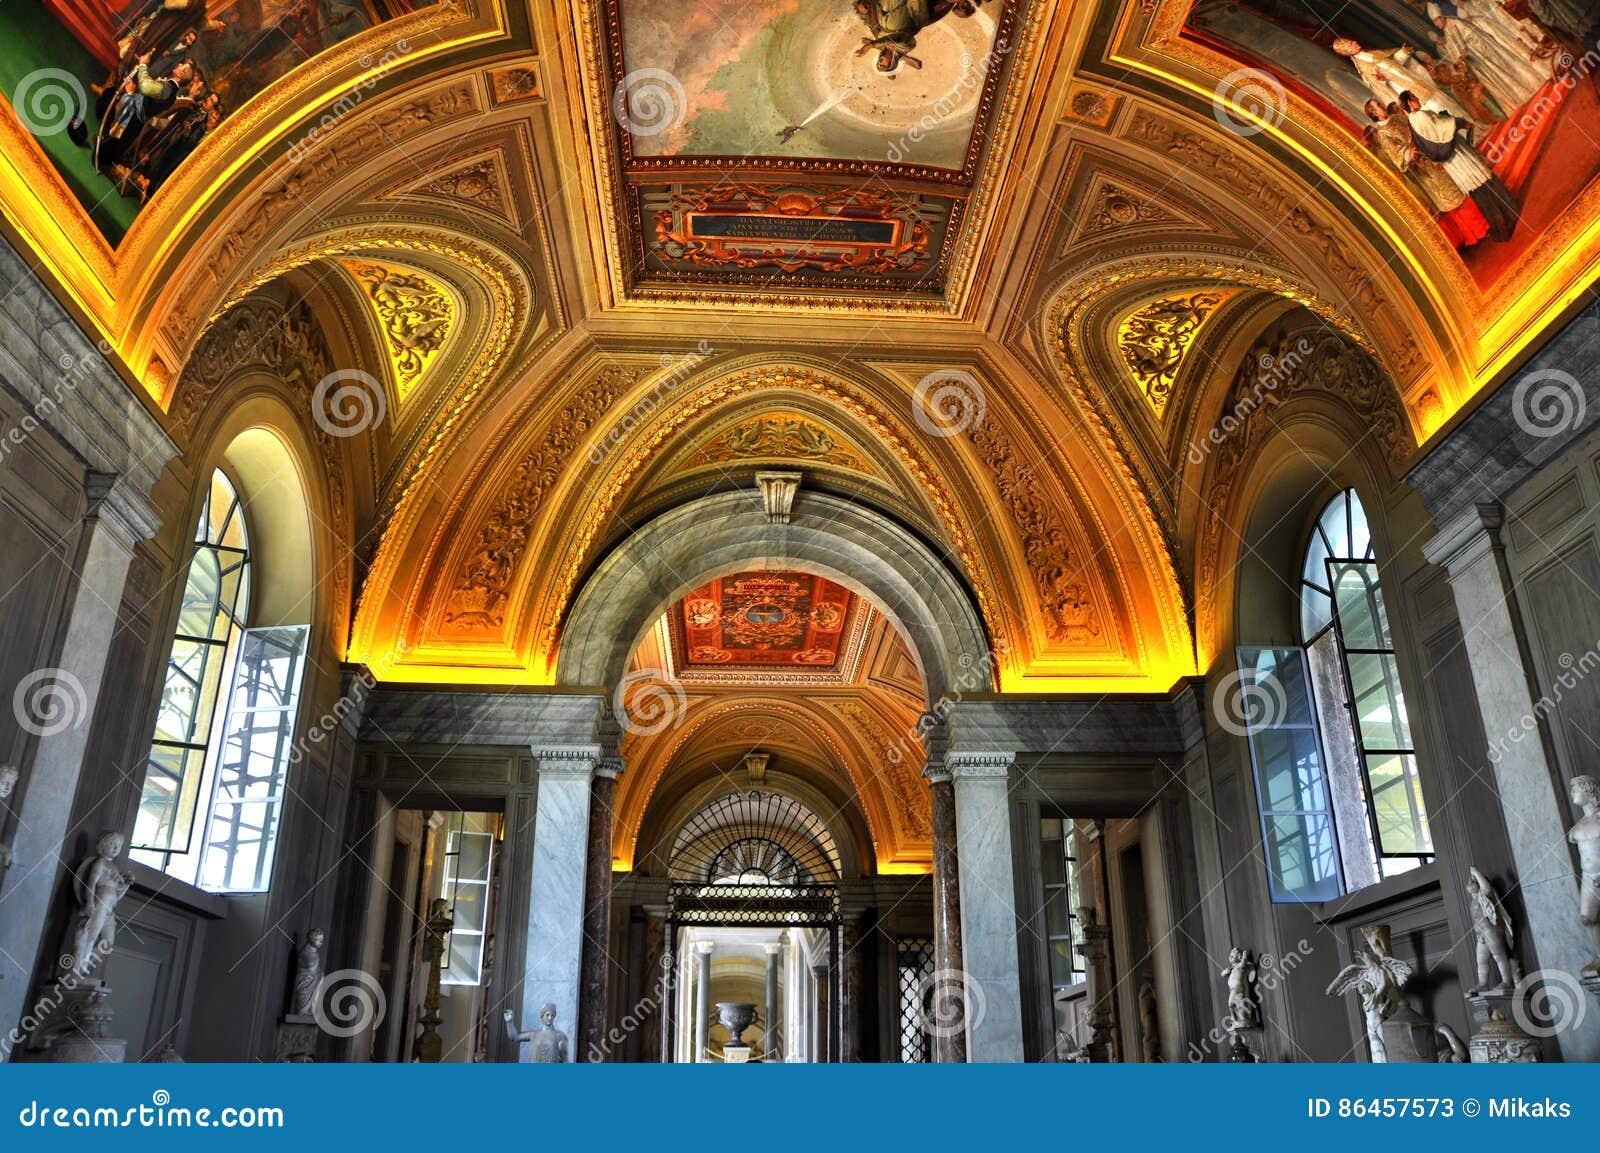 Interiors and architectural details rooms in Vatican museum,Vatican city, Vatican